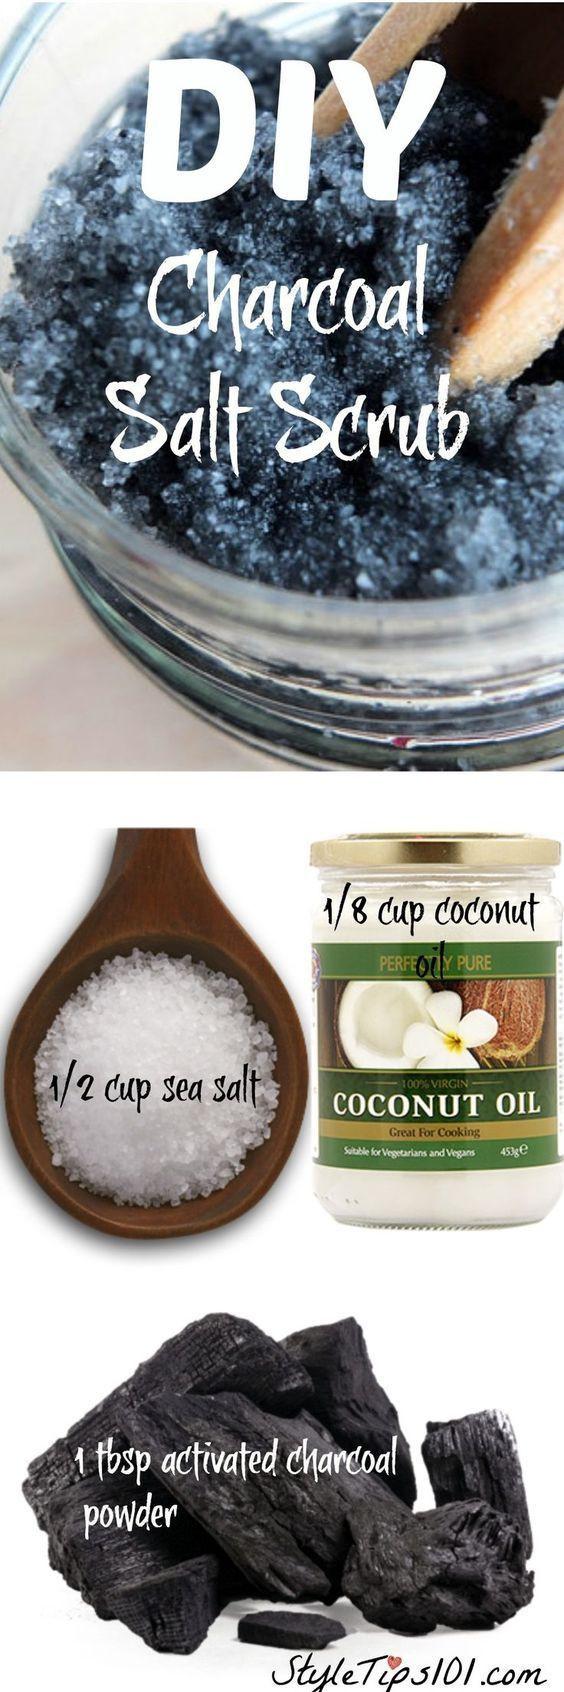 Best ideas about DIY Sea Salt Scrub . Save or Pin Best 25 Salt scrubs ideas on Pinterest Now.